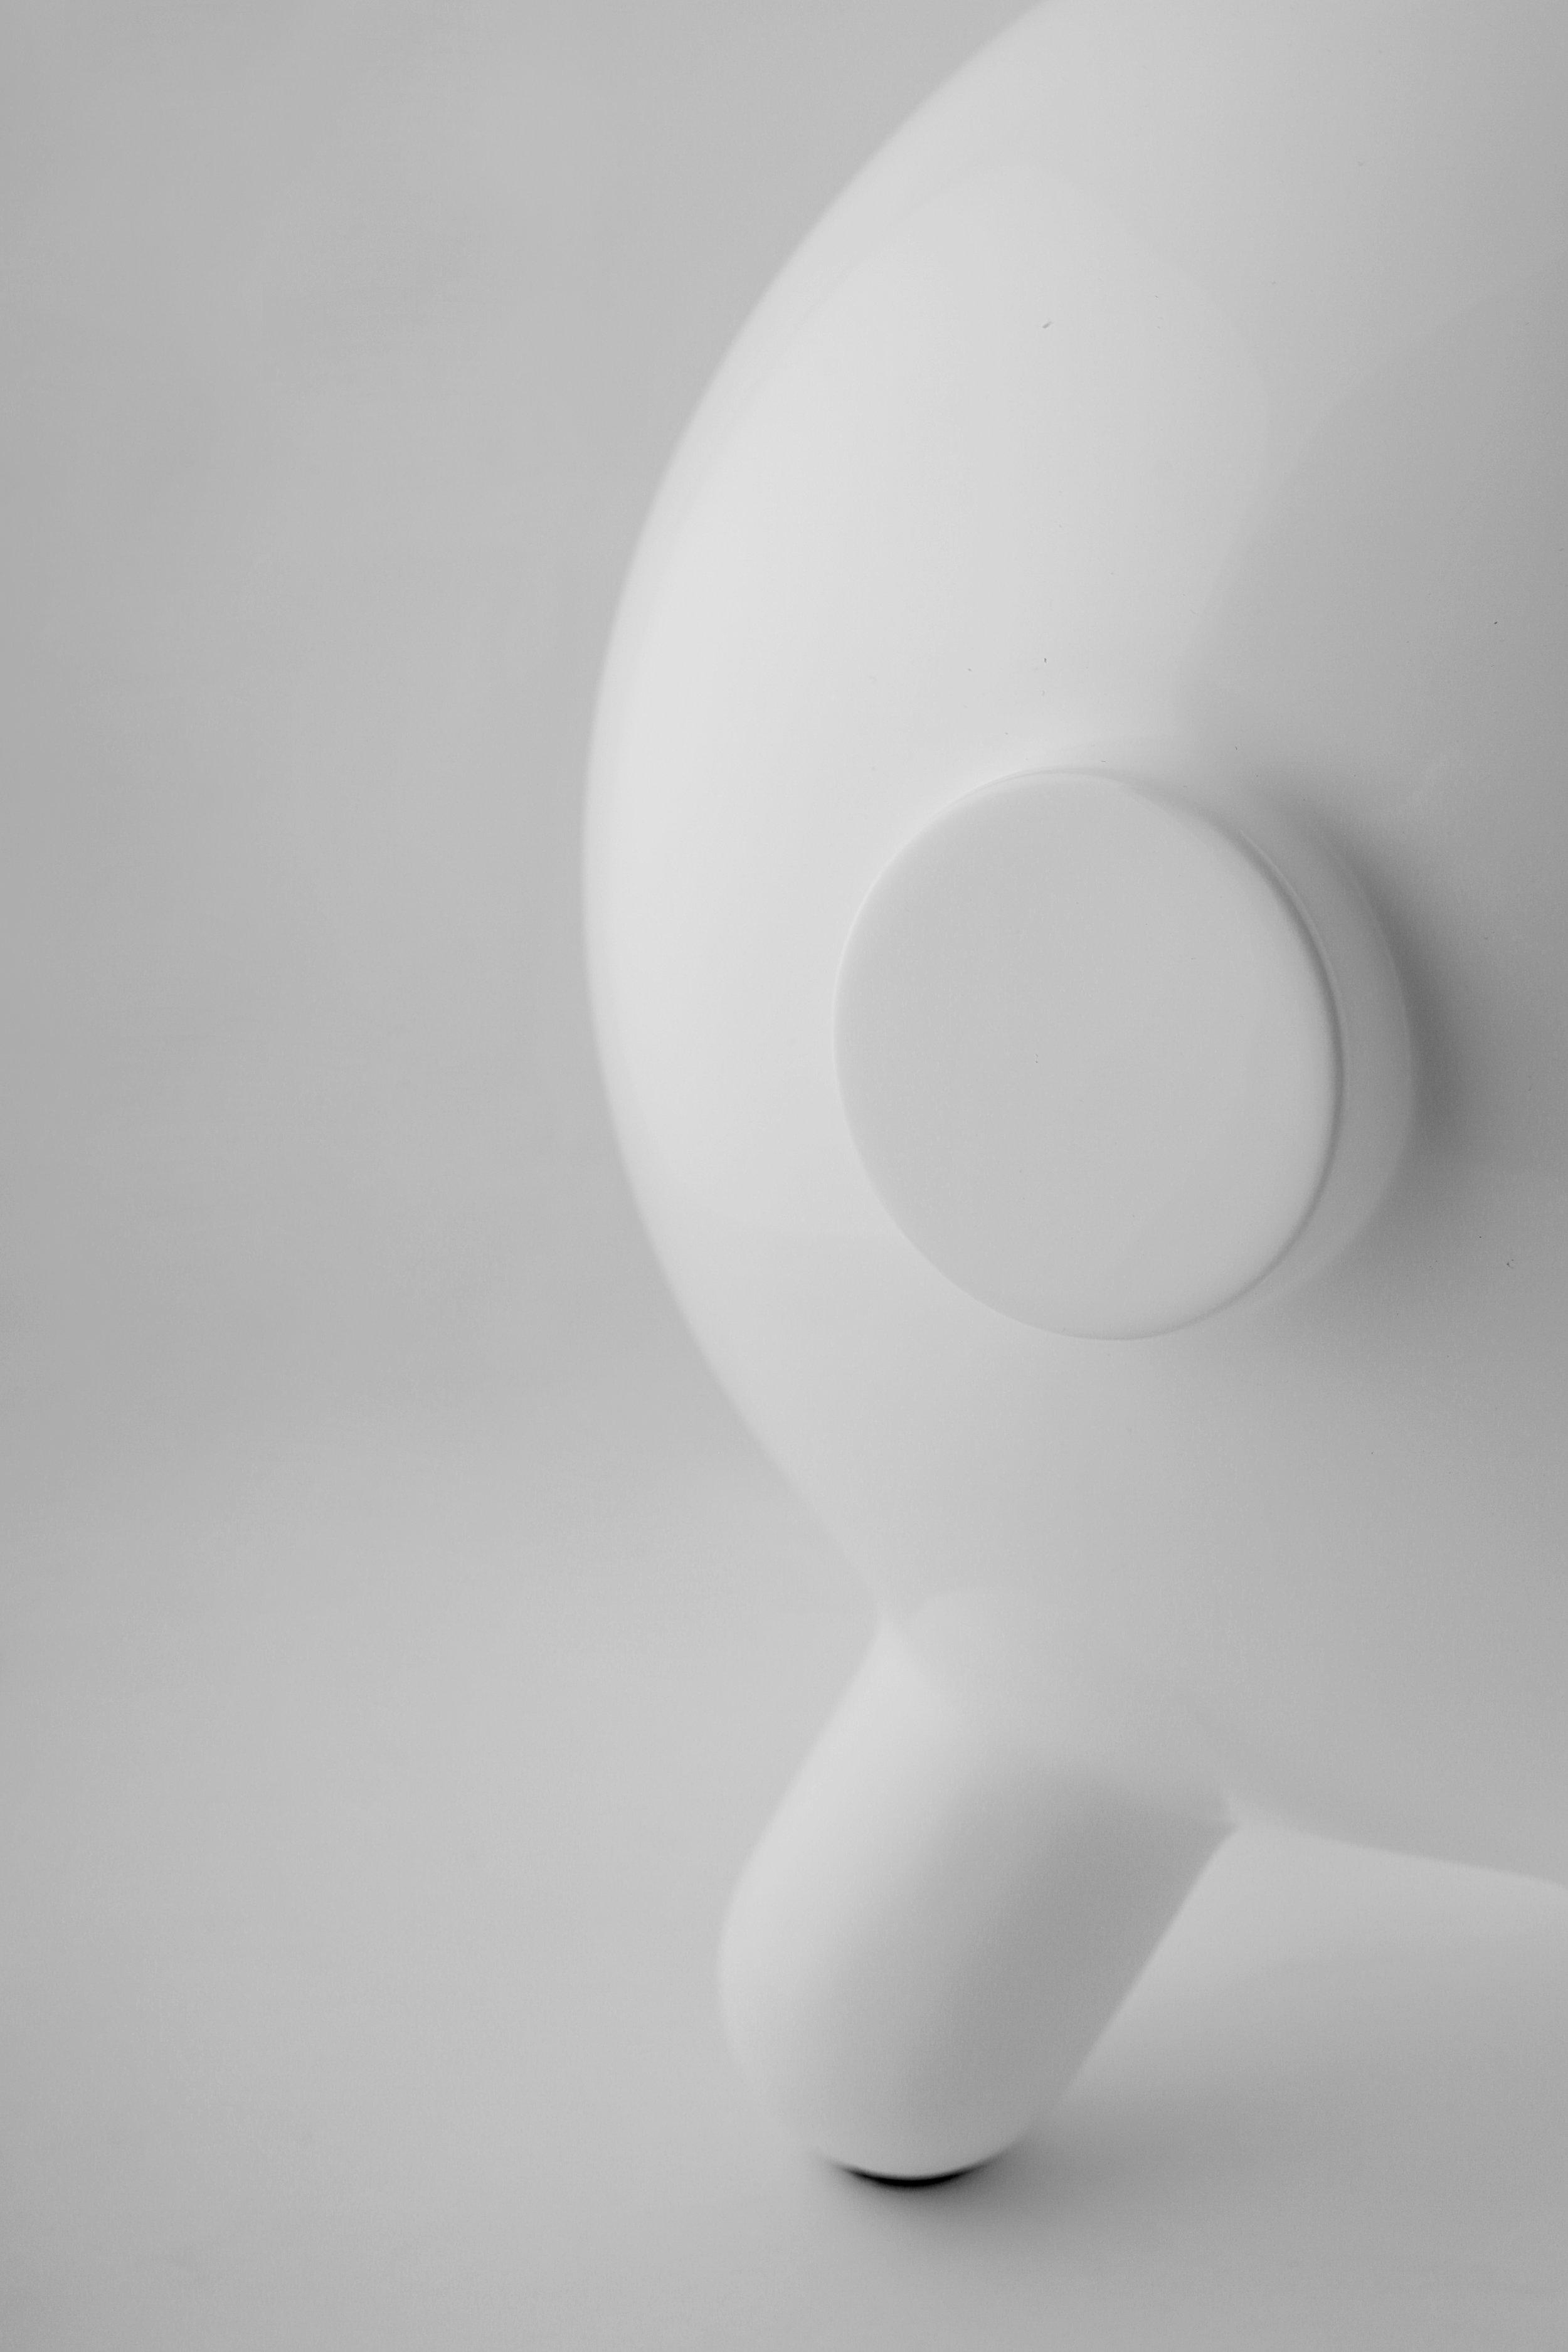 Pogo by Joel Escalona for Nono Photo by Mariana Achach — 02.jpg